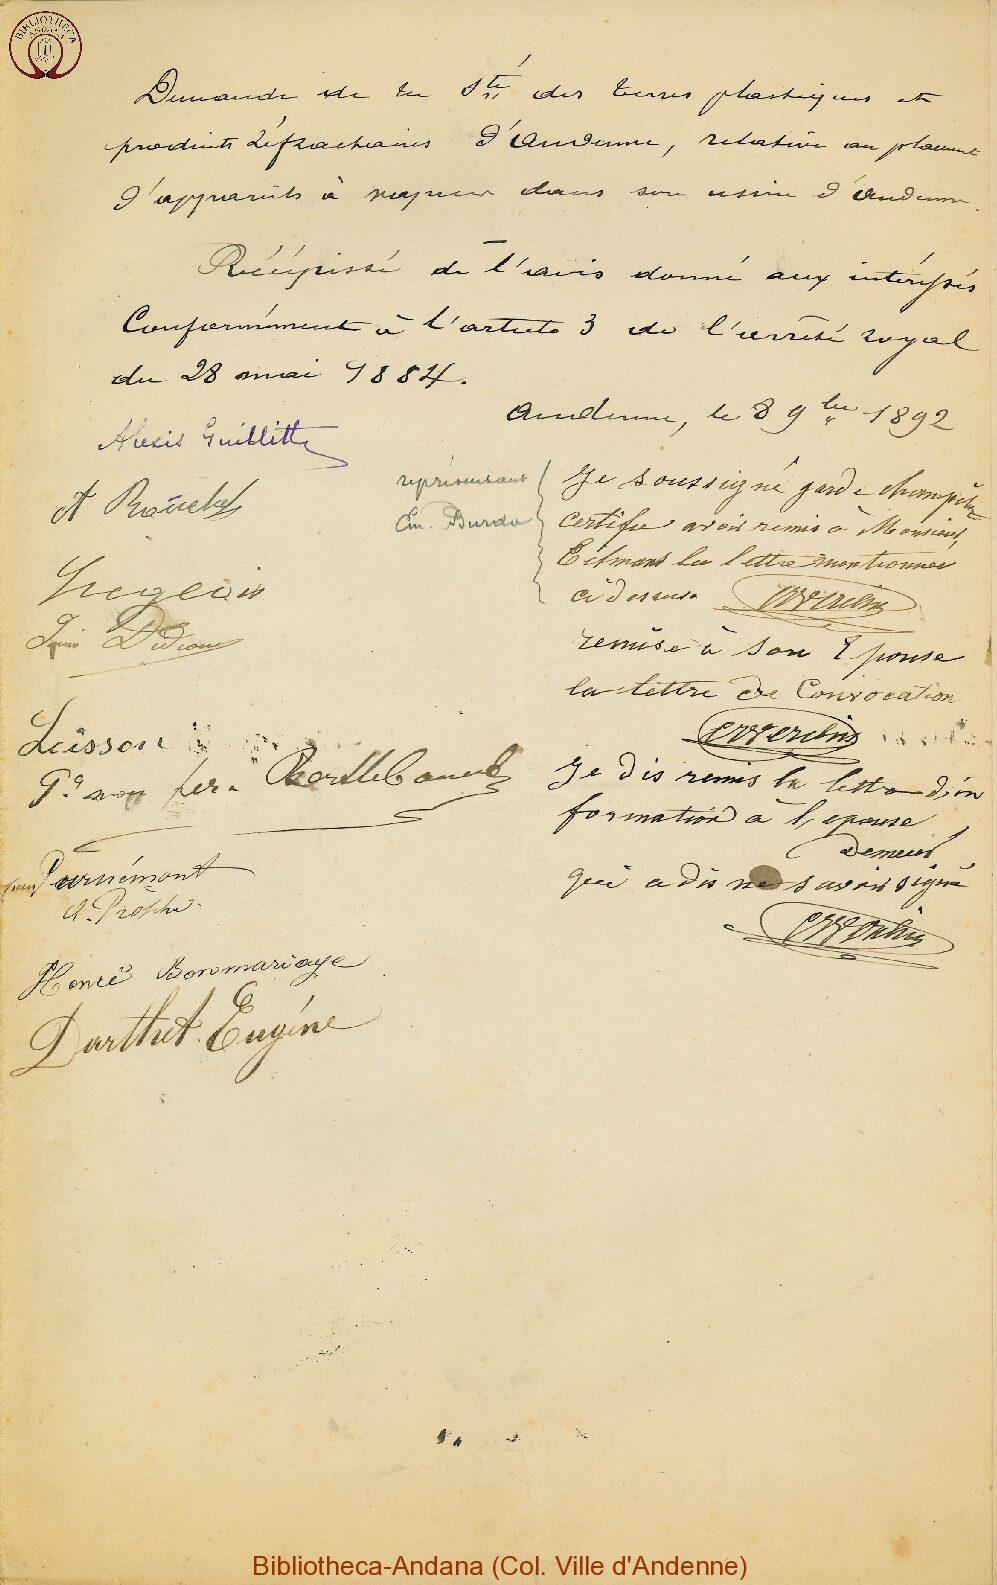 1892-11-08